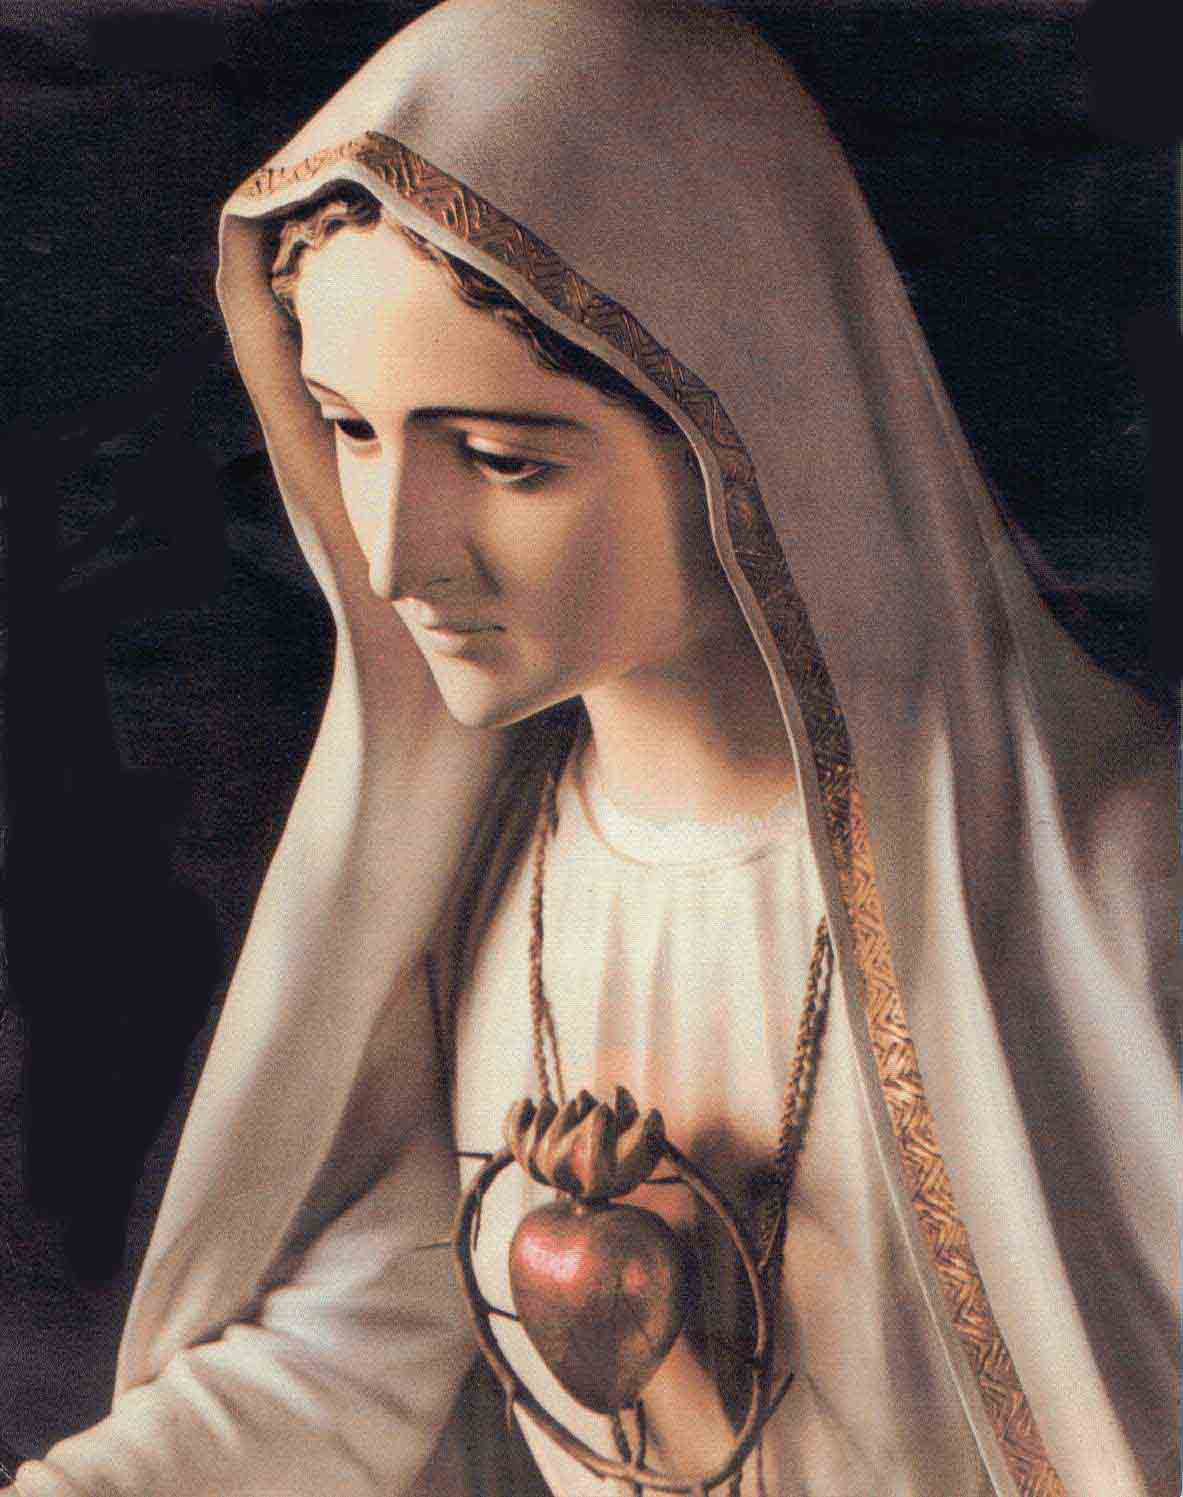 Matka Boża Fatimska